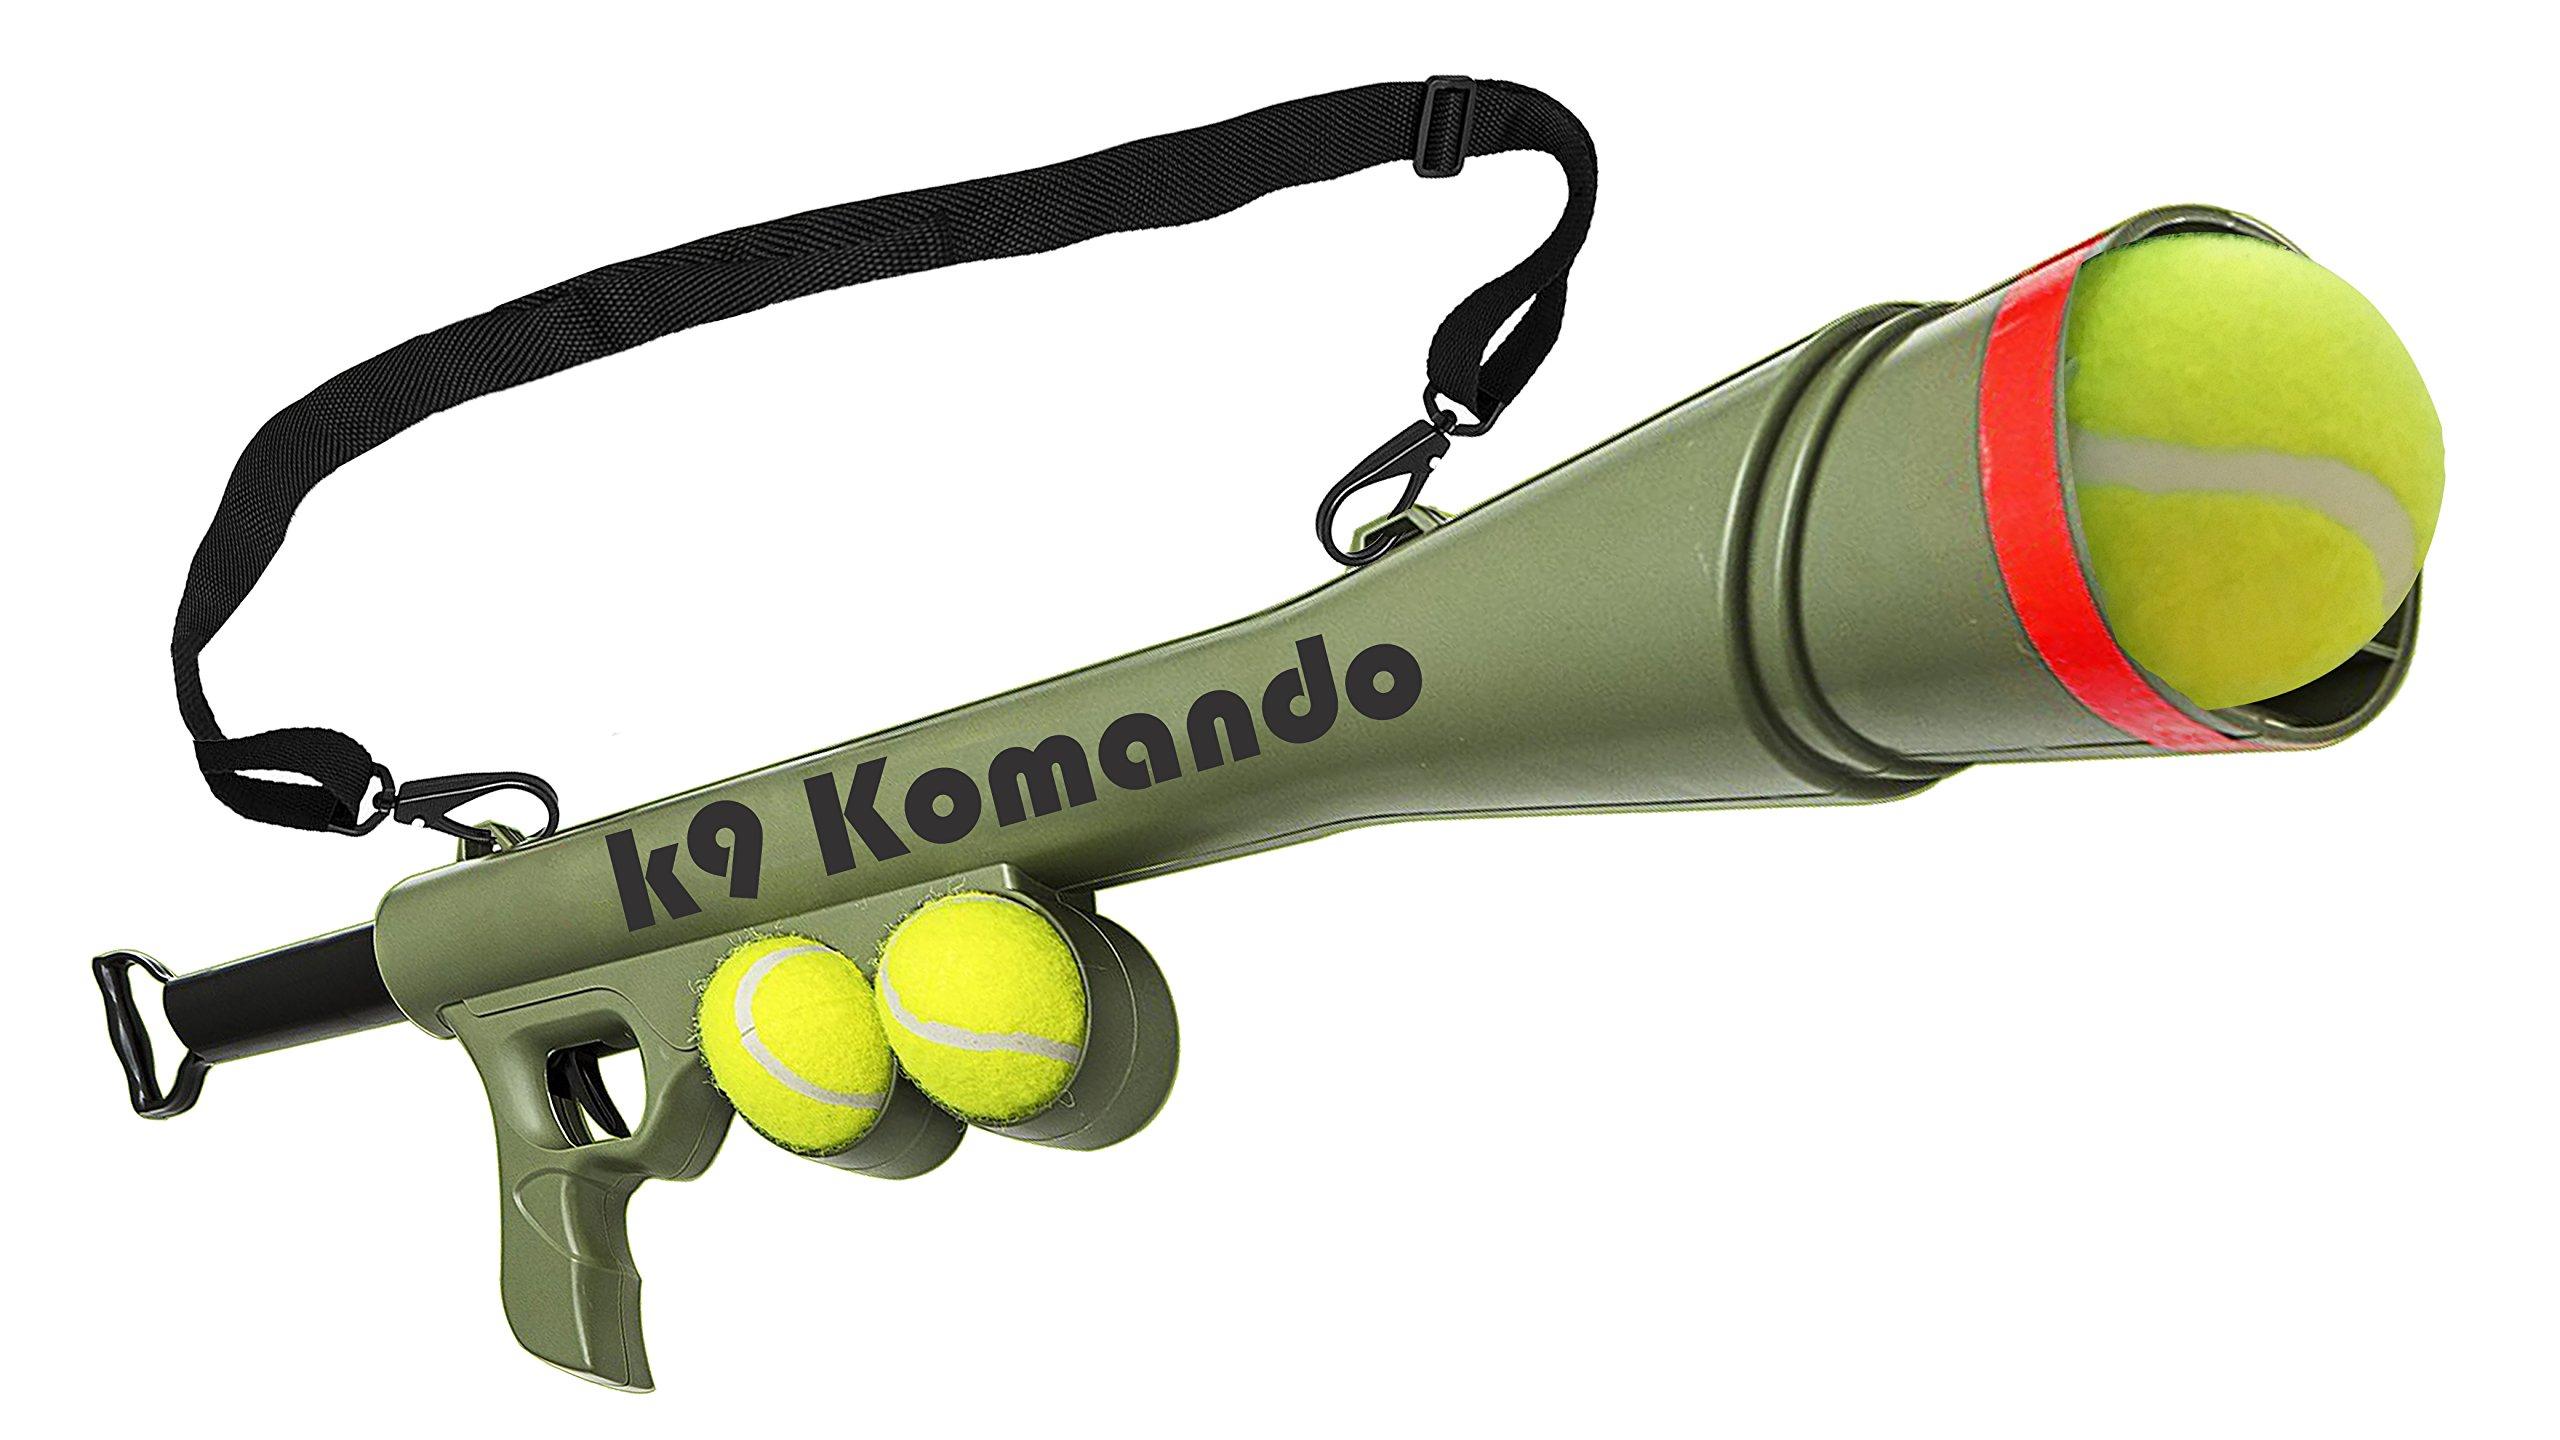 Dog Komando K-9 Tennis Ball Launcher Gun includes 2 Squeaky Balls Best Pet Dog Toy Ball Thrower - Semi Automatic Blast